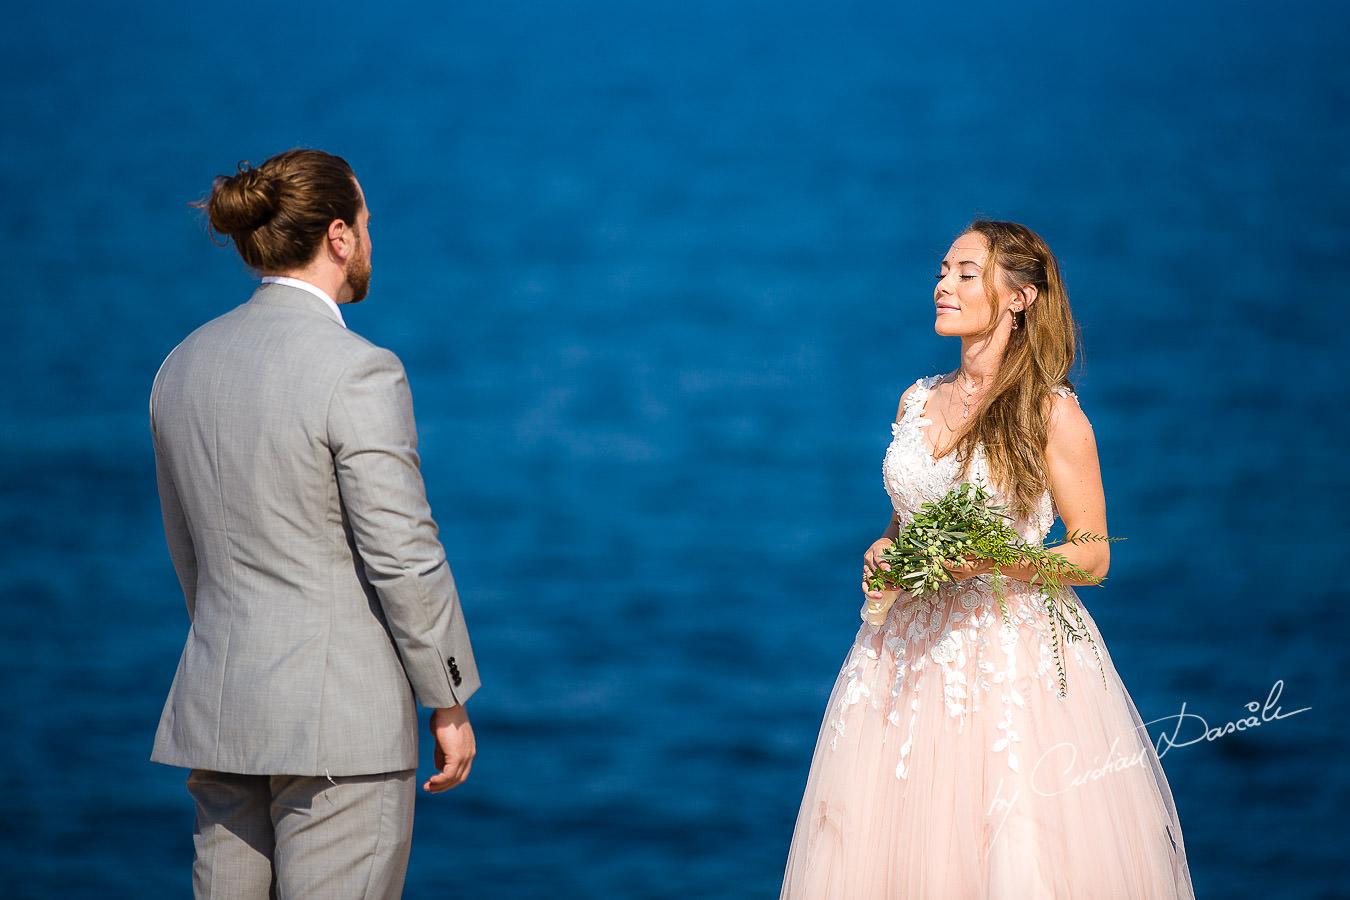 Bride and Groom during Wedding Ceremony, captured at a Shamanic Wedding Ceremony by Cyprus Wedding Photographer Cristian Dascalu.